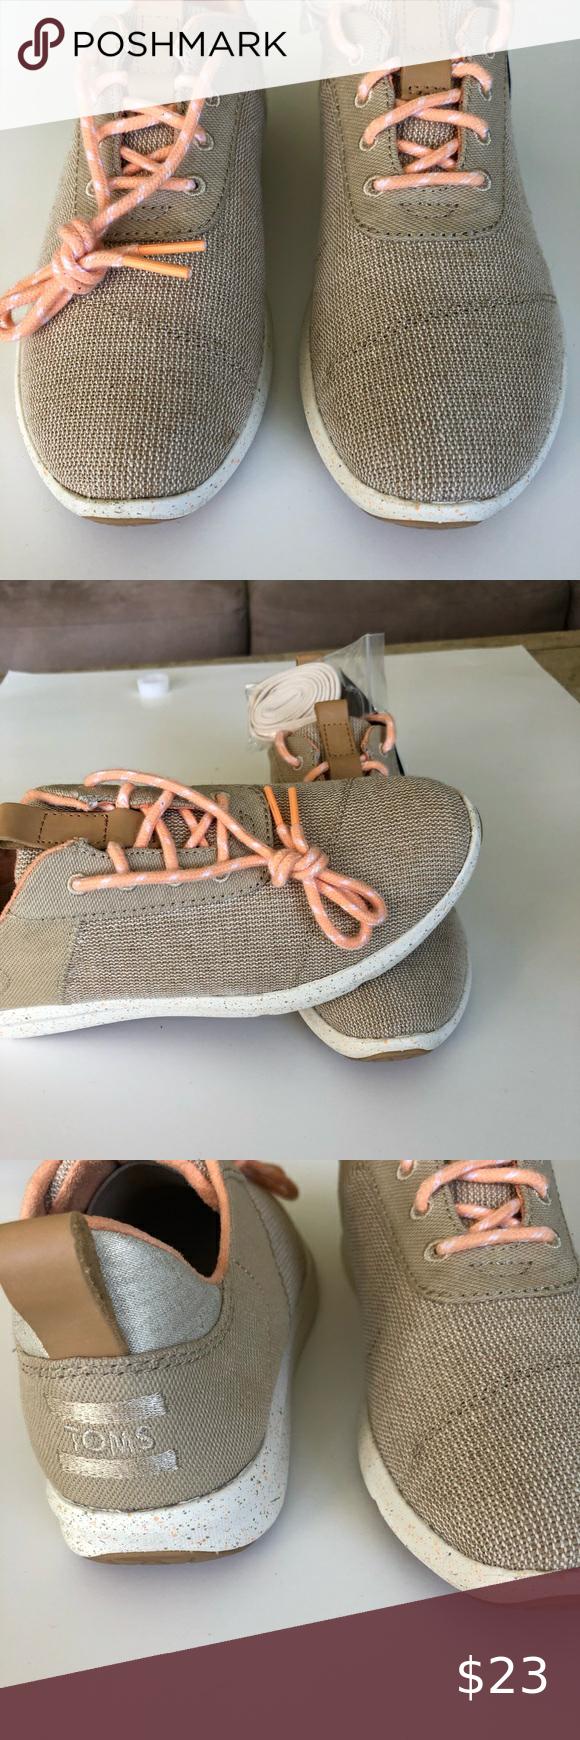 Runway fashion #shoes #canvas Tom shoes canvas, Tom shoes heels, Tom shoes cele